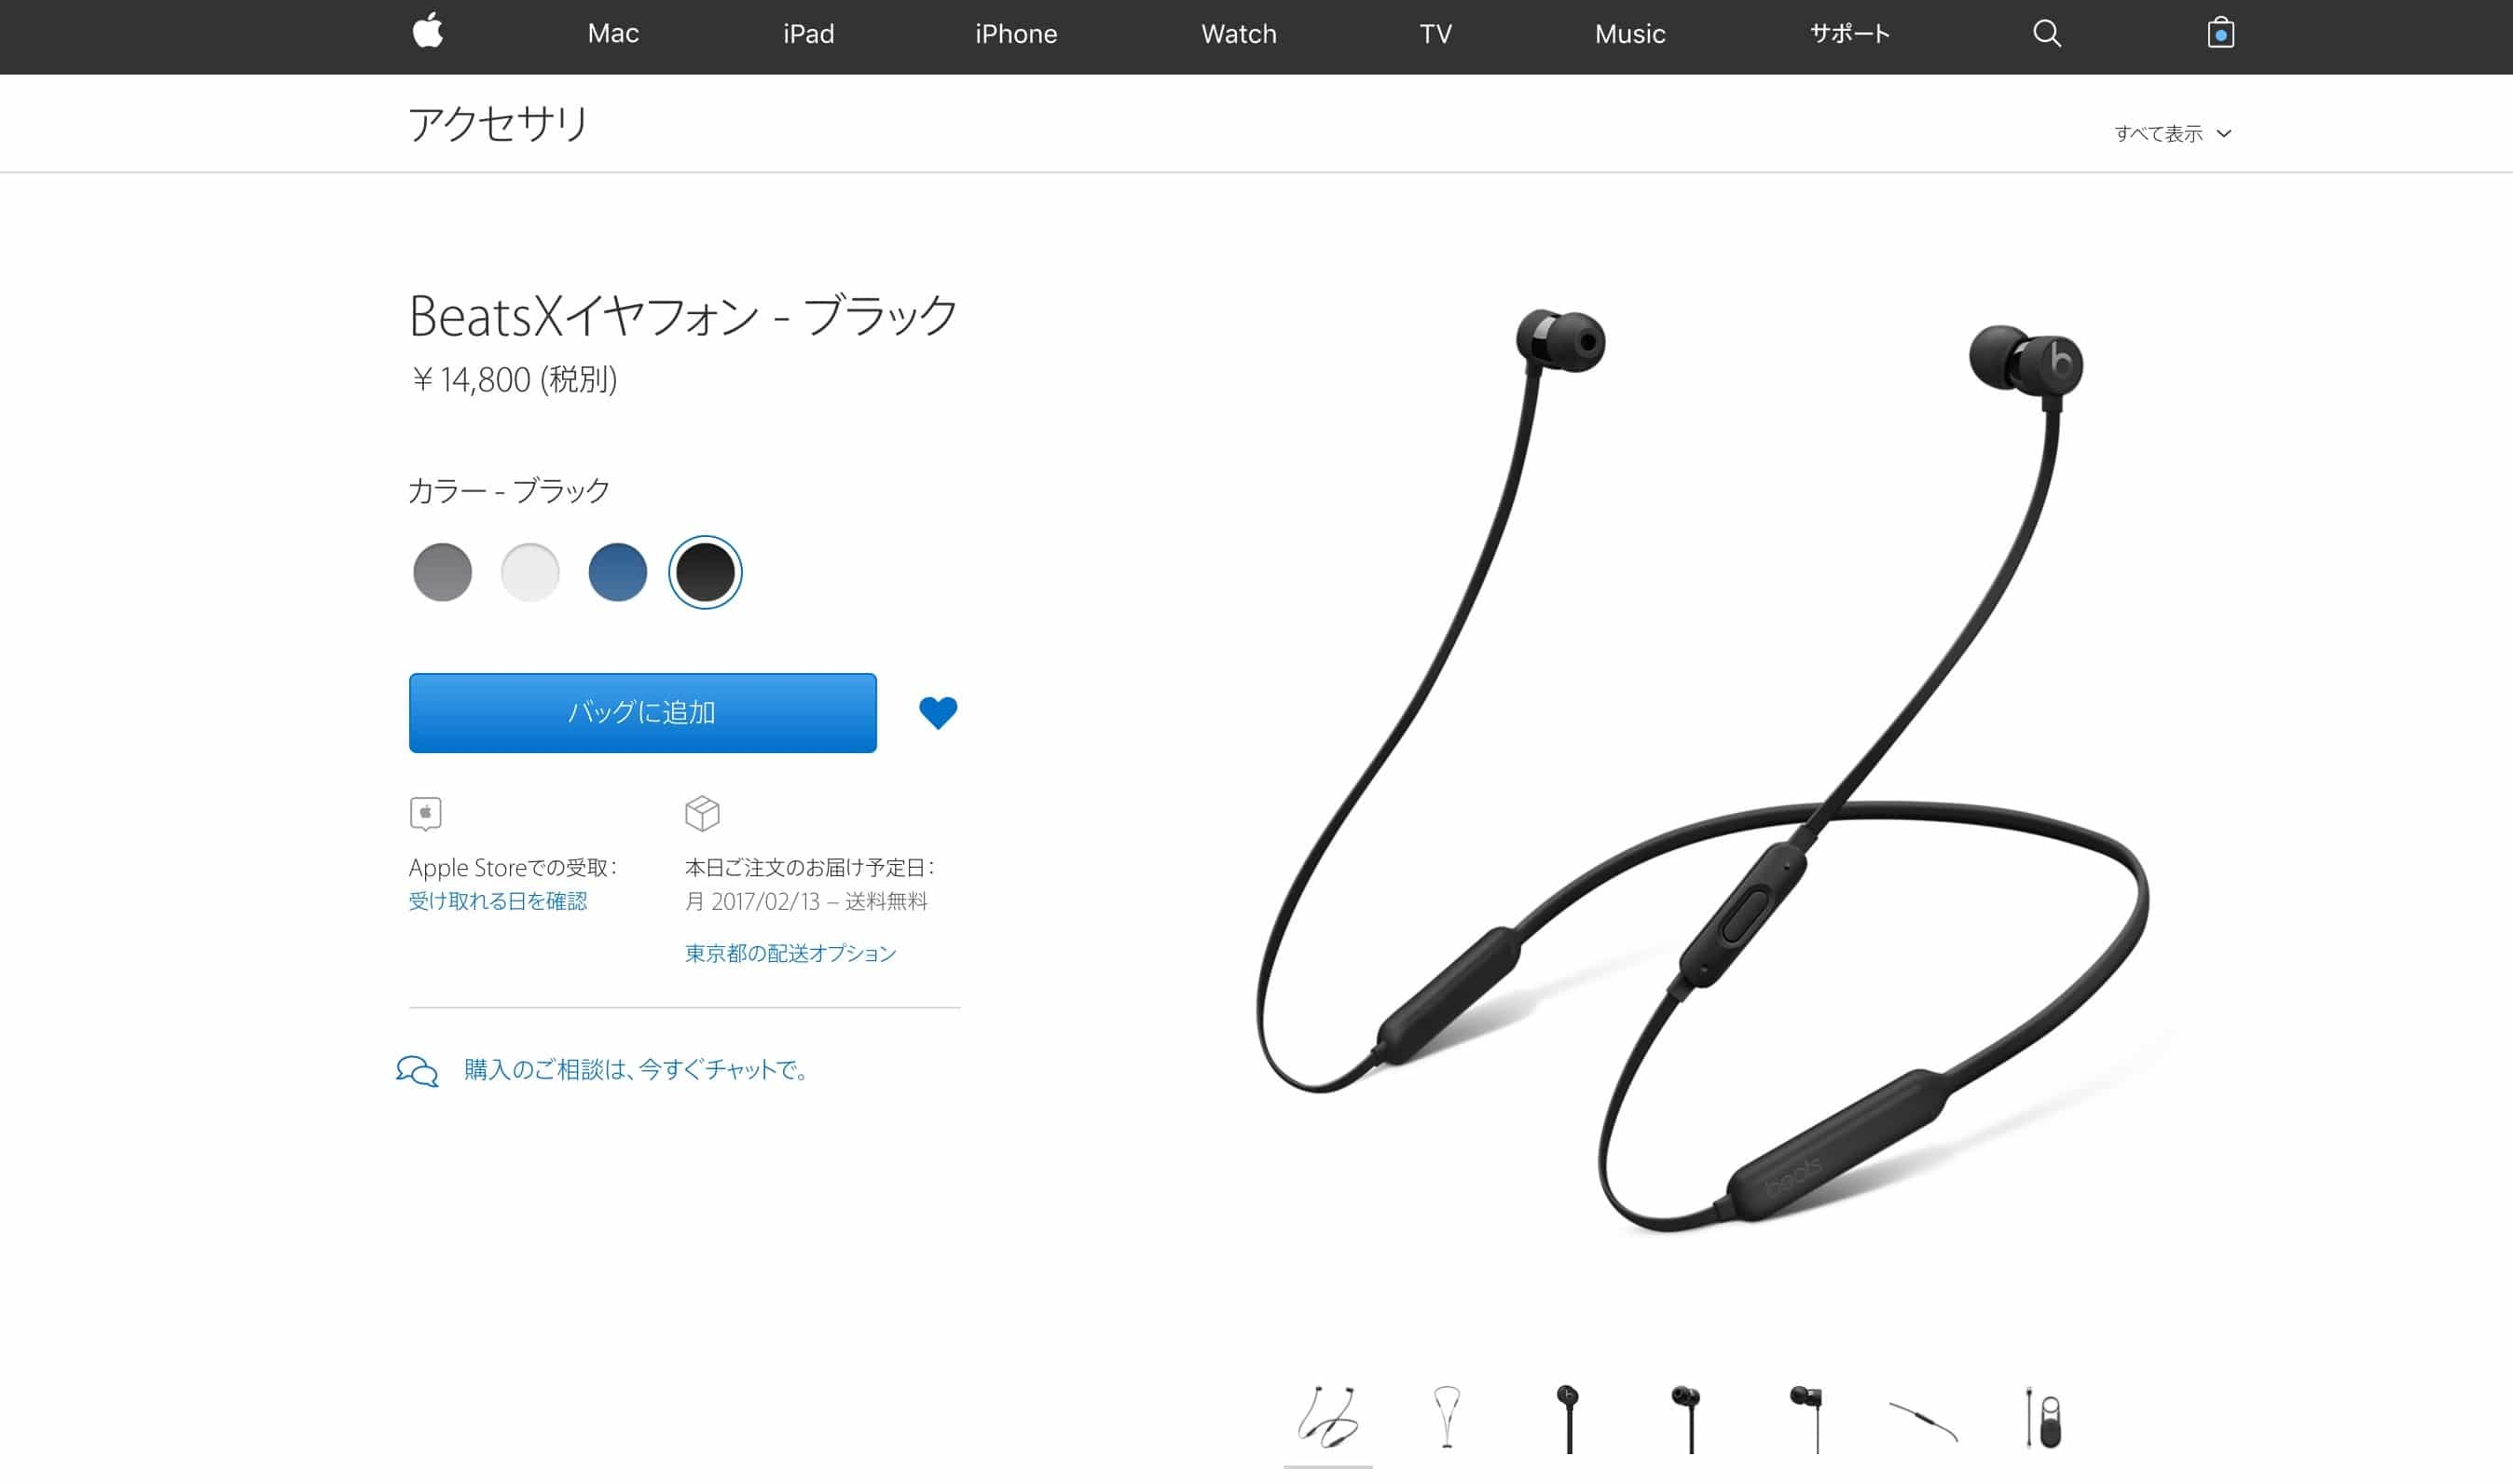 Beatsx Apple Store